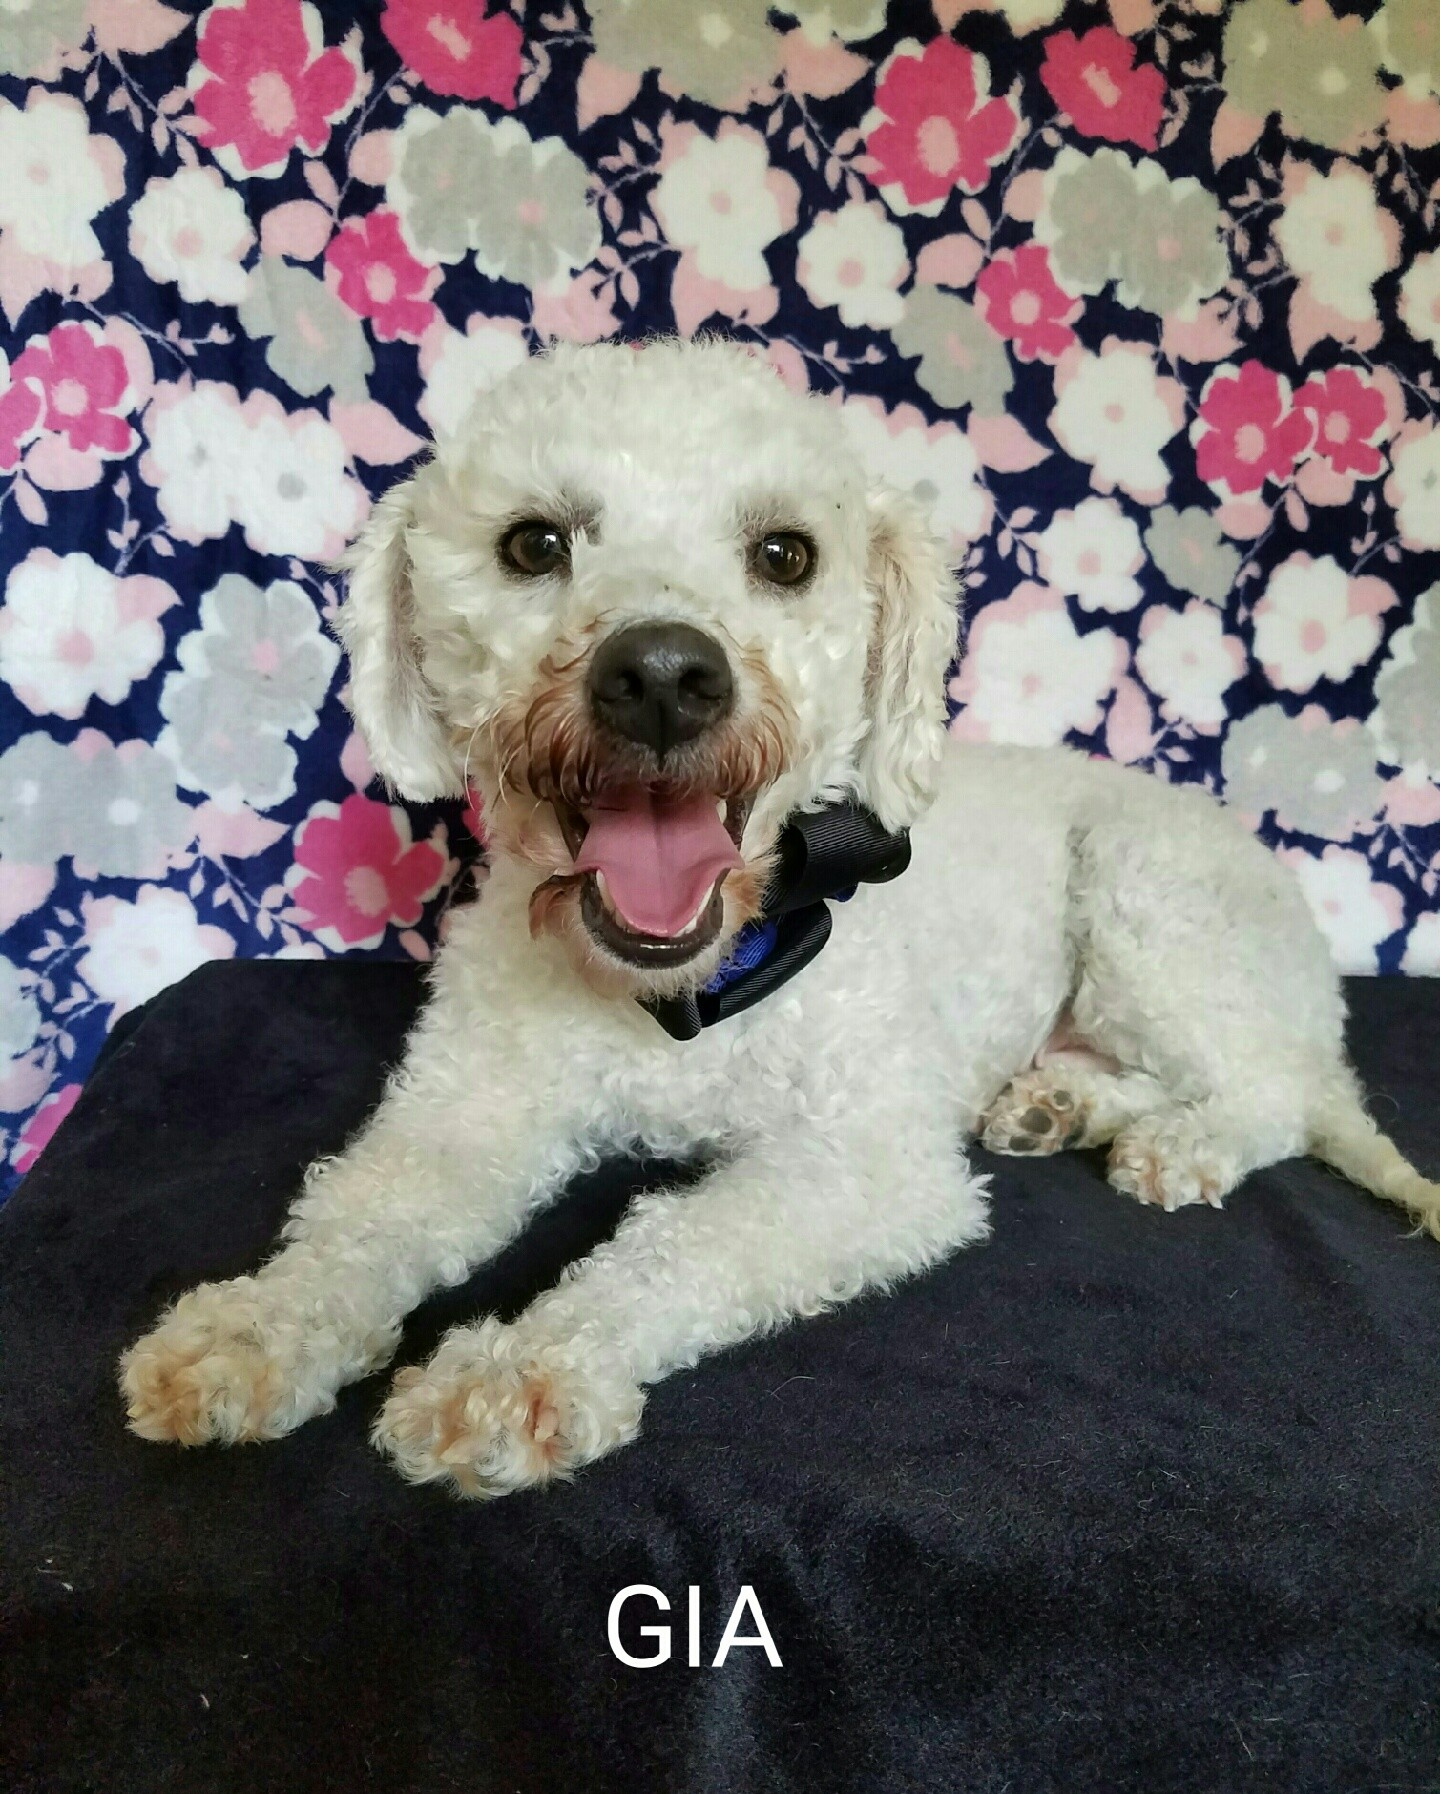 Vancouver Bc Poodle Miniature Meet Gia A Pet For Adoption